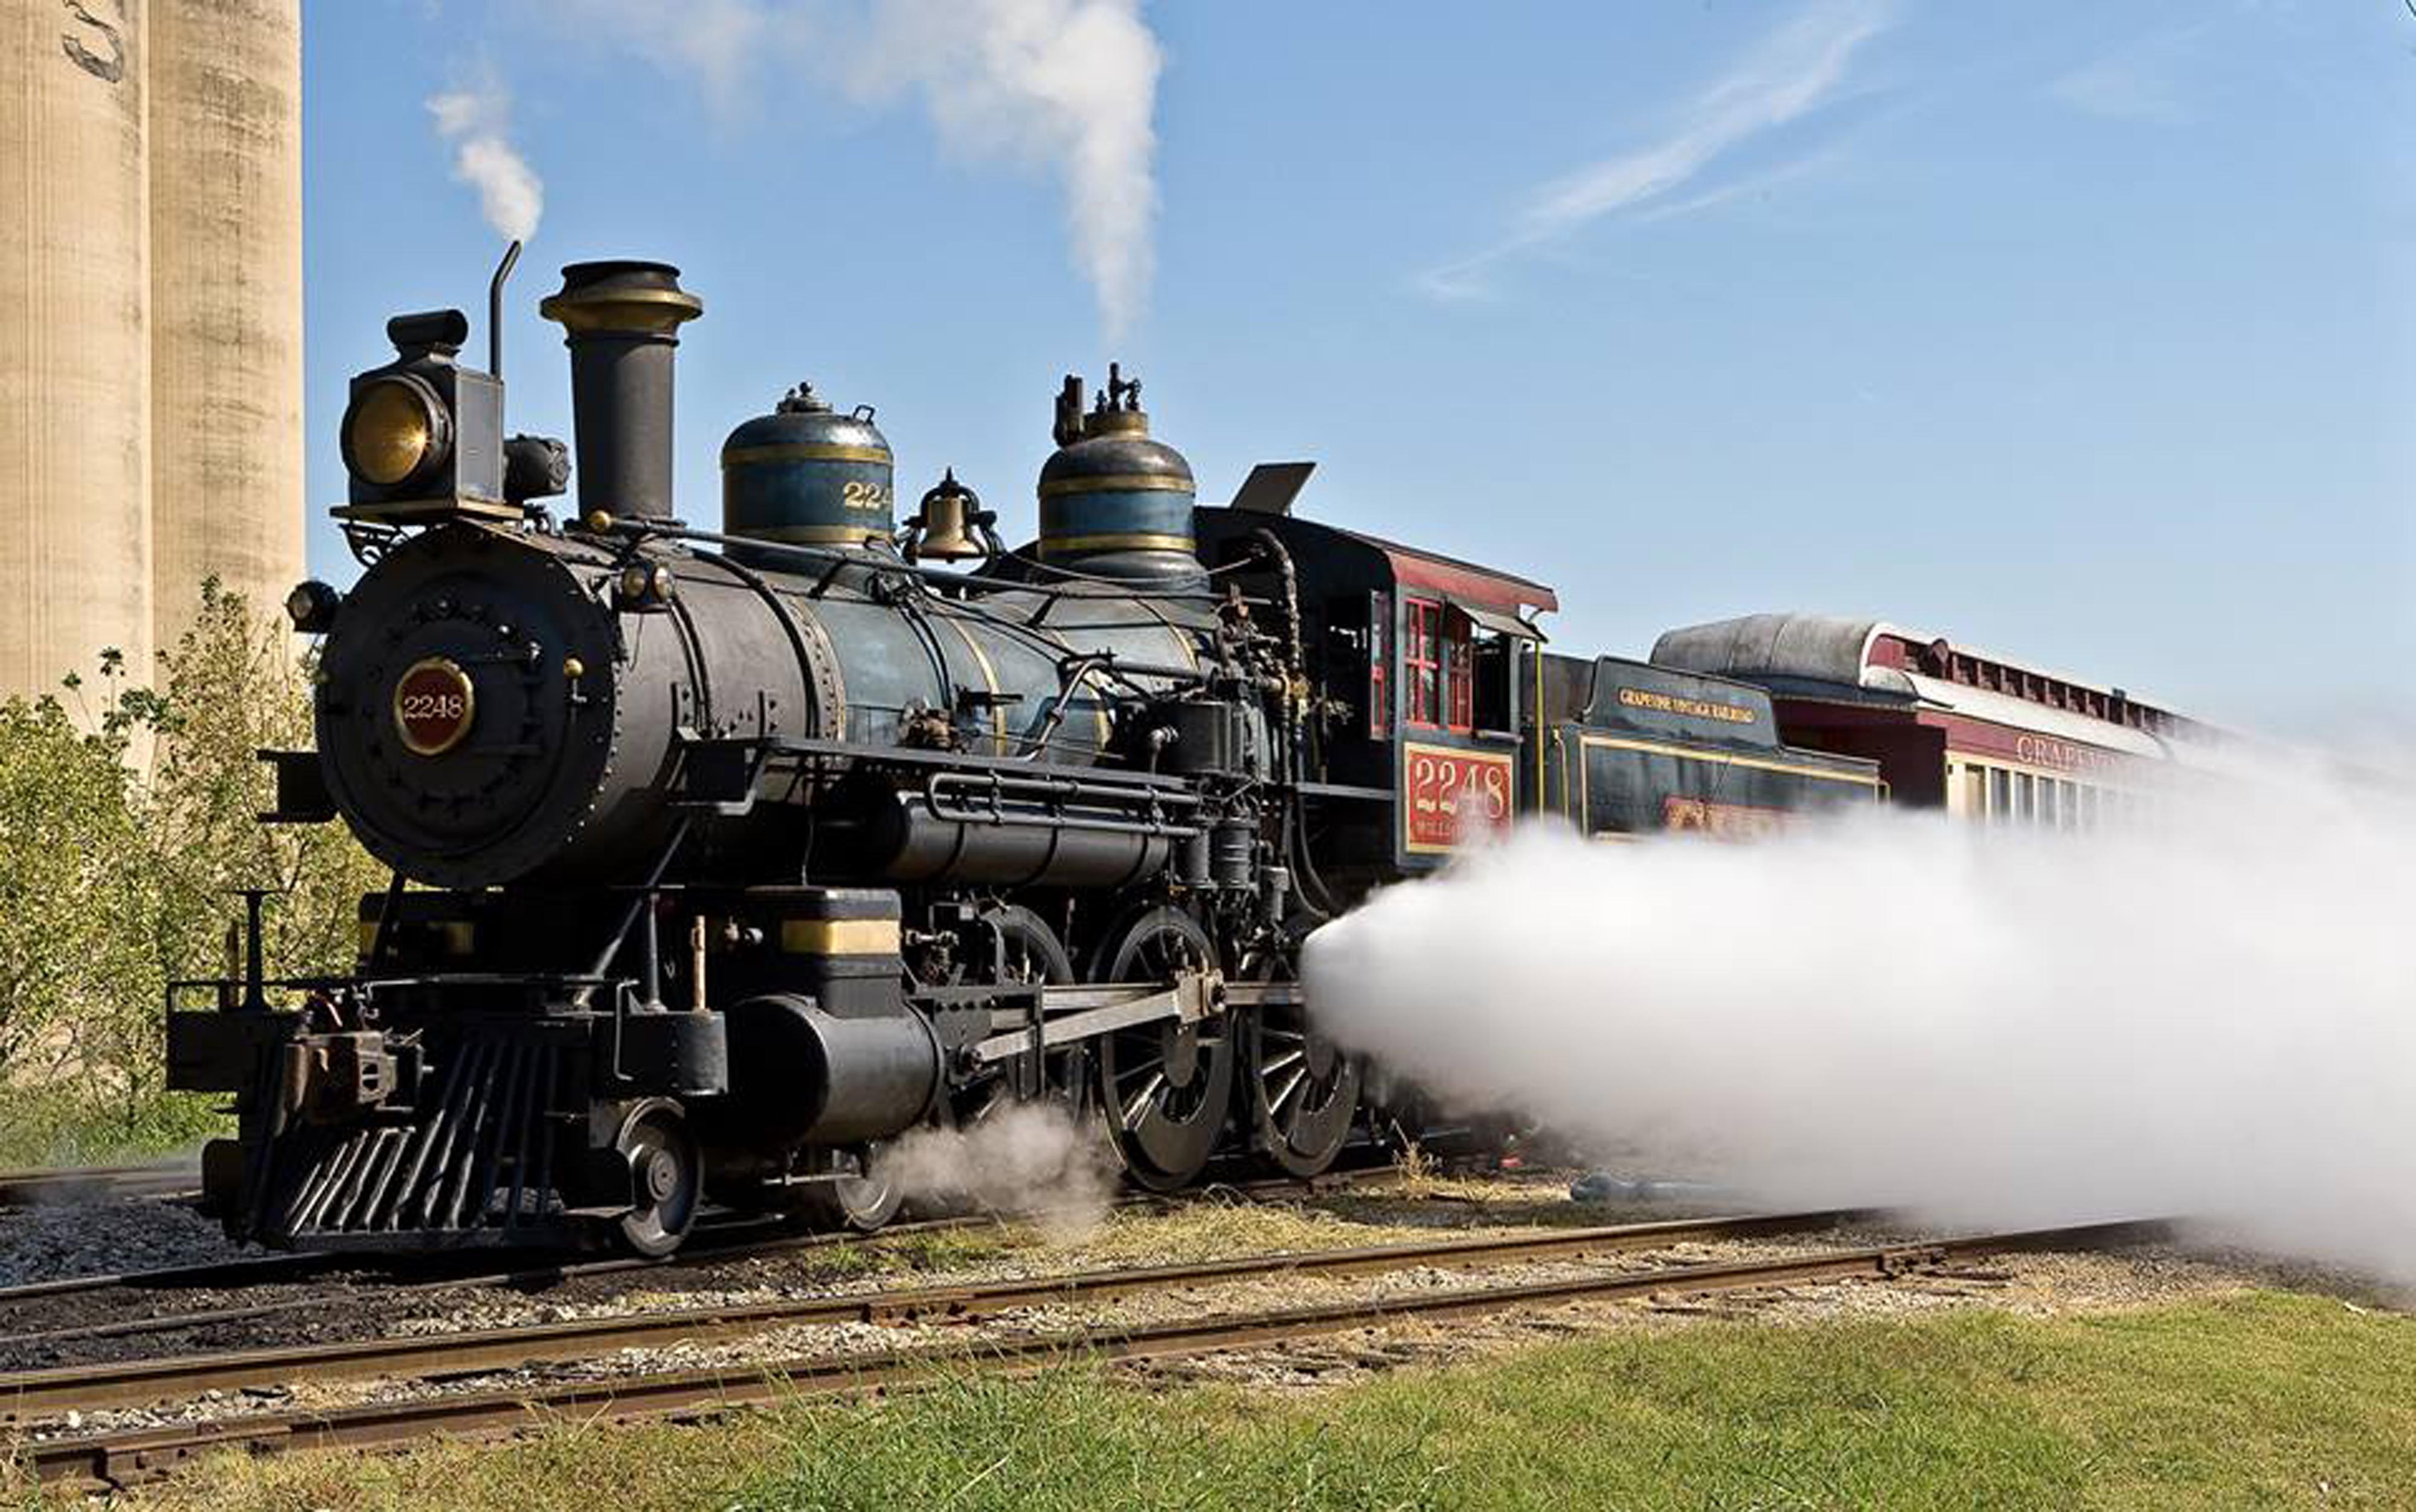 Hop Aboard the Halloween Treat Train